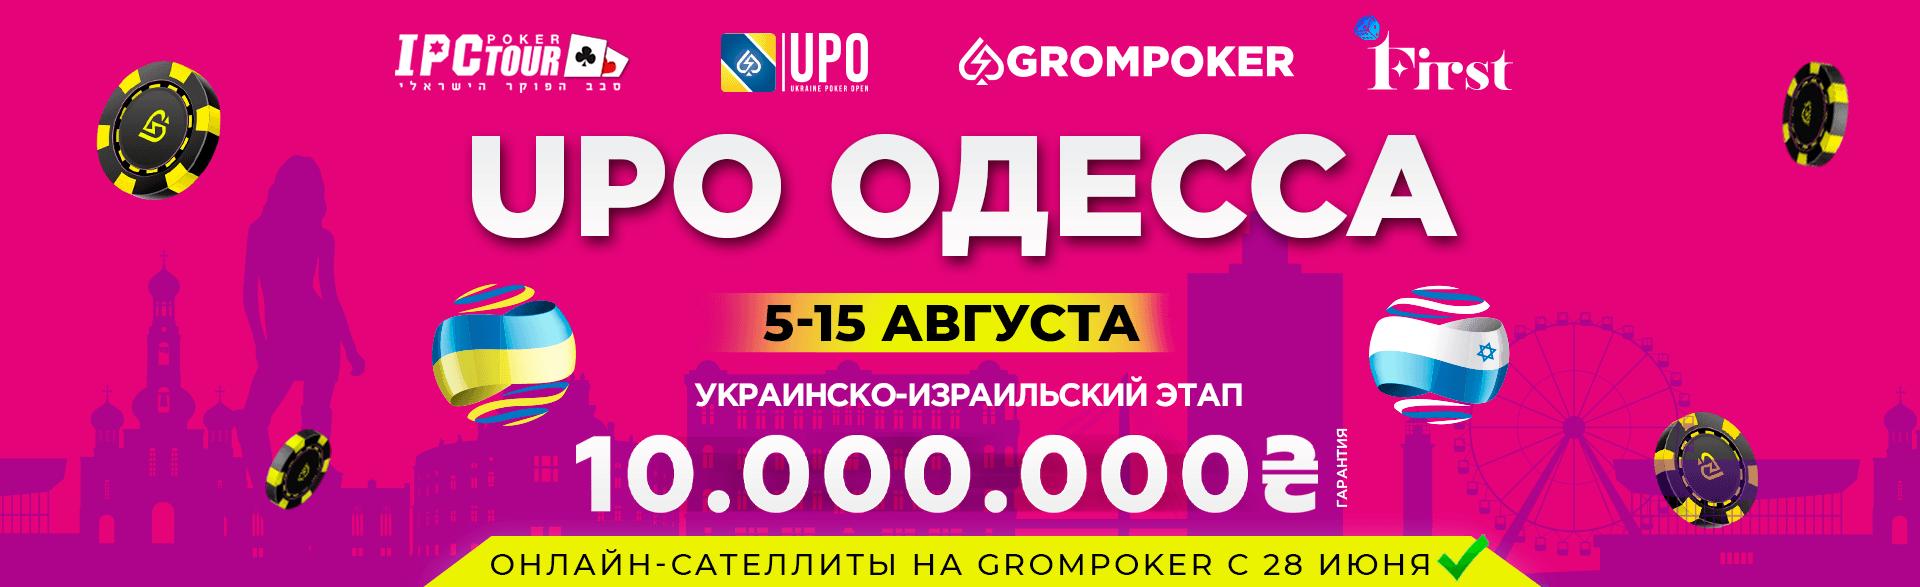 UPO & IPC Одесса